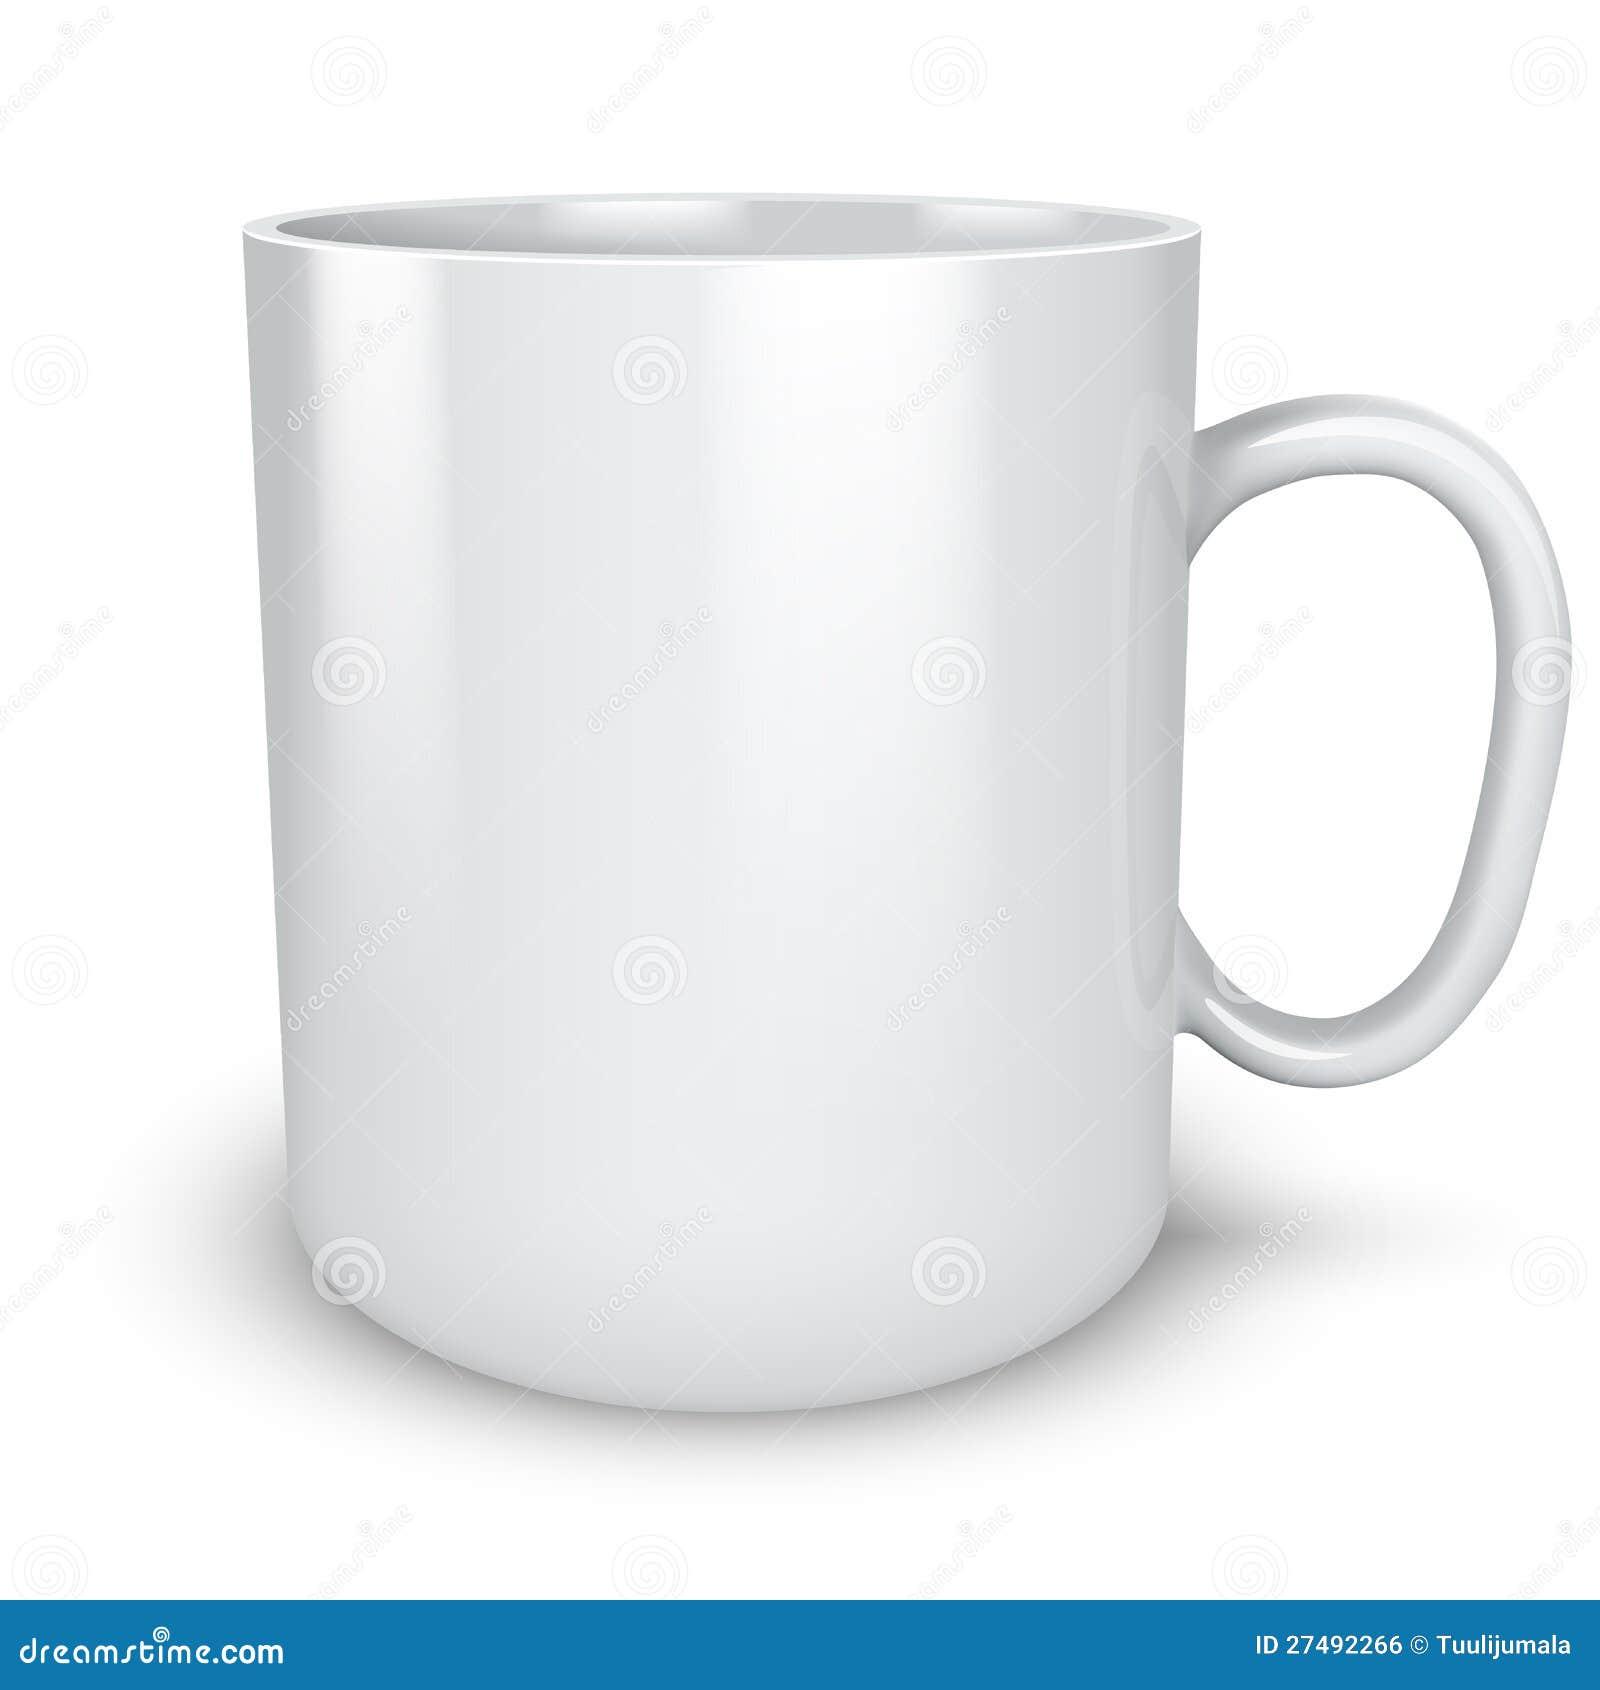 blank white mug royalty free stock image image 27492266. Black Bedroom Furniture Sets. Home Design Ideas